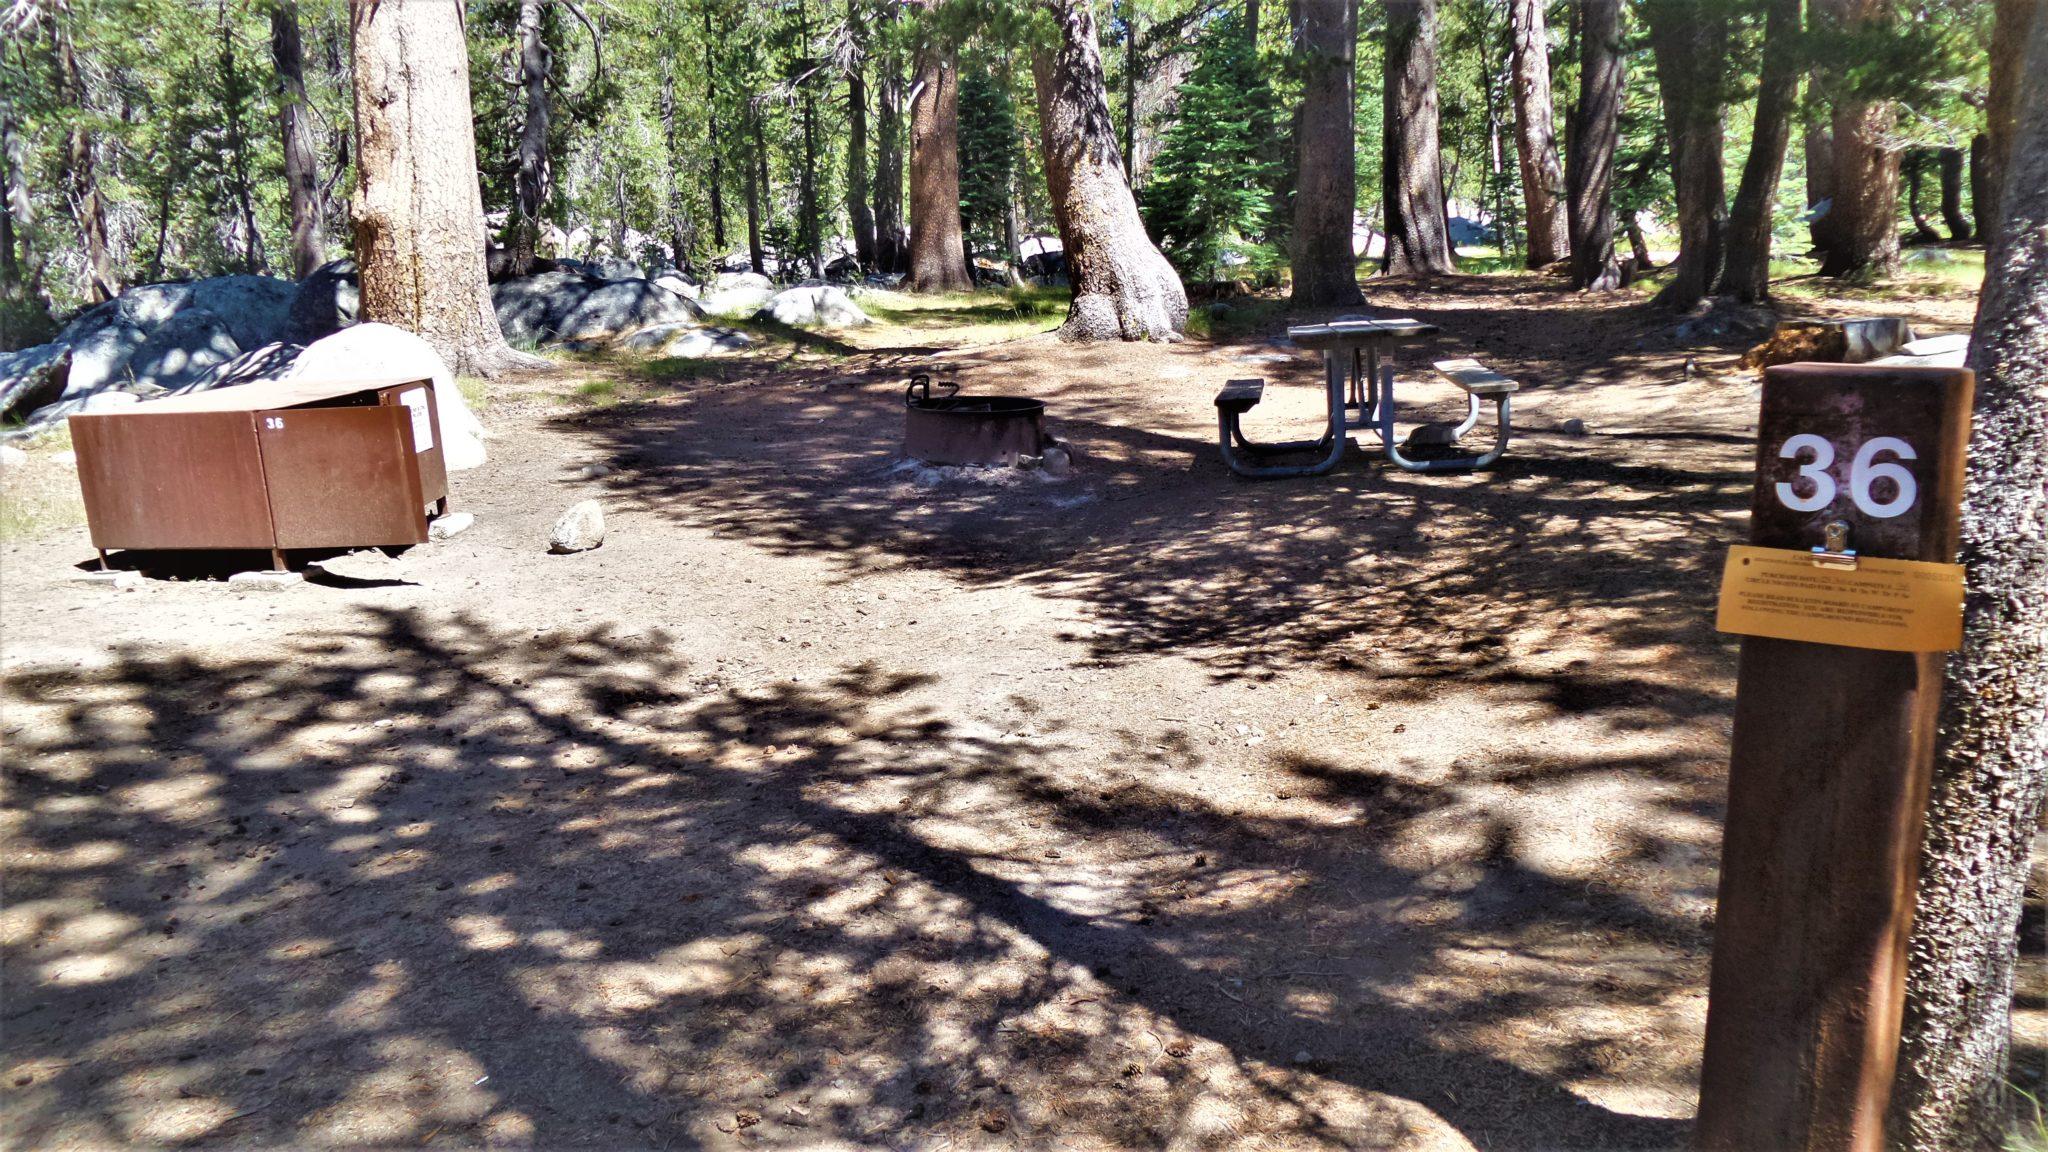 Spot 36 Porcupine Flat Campground, Yosemite